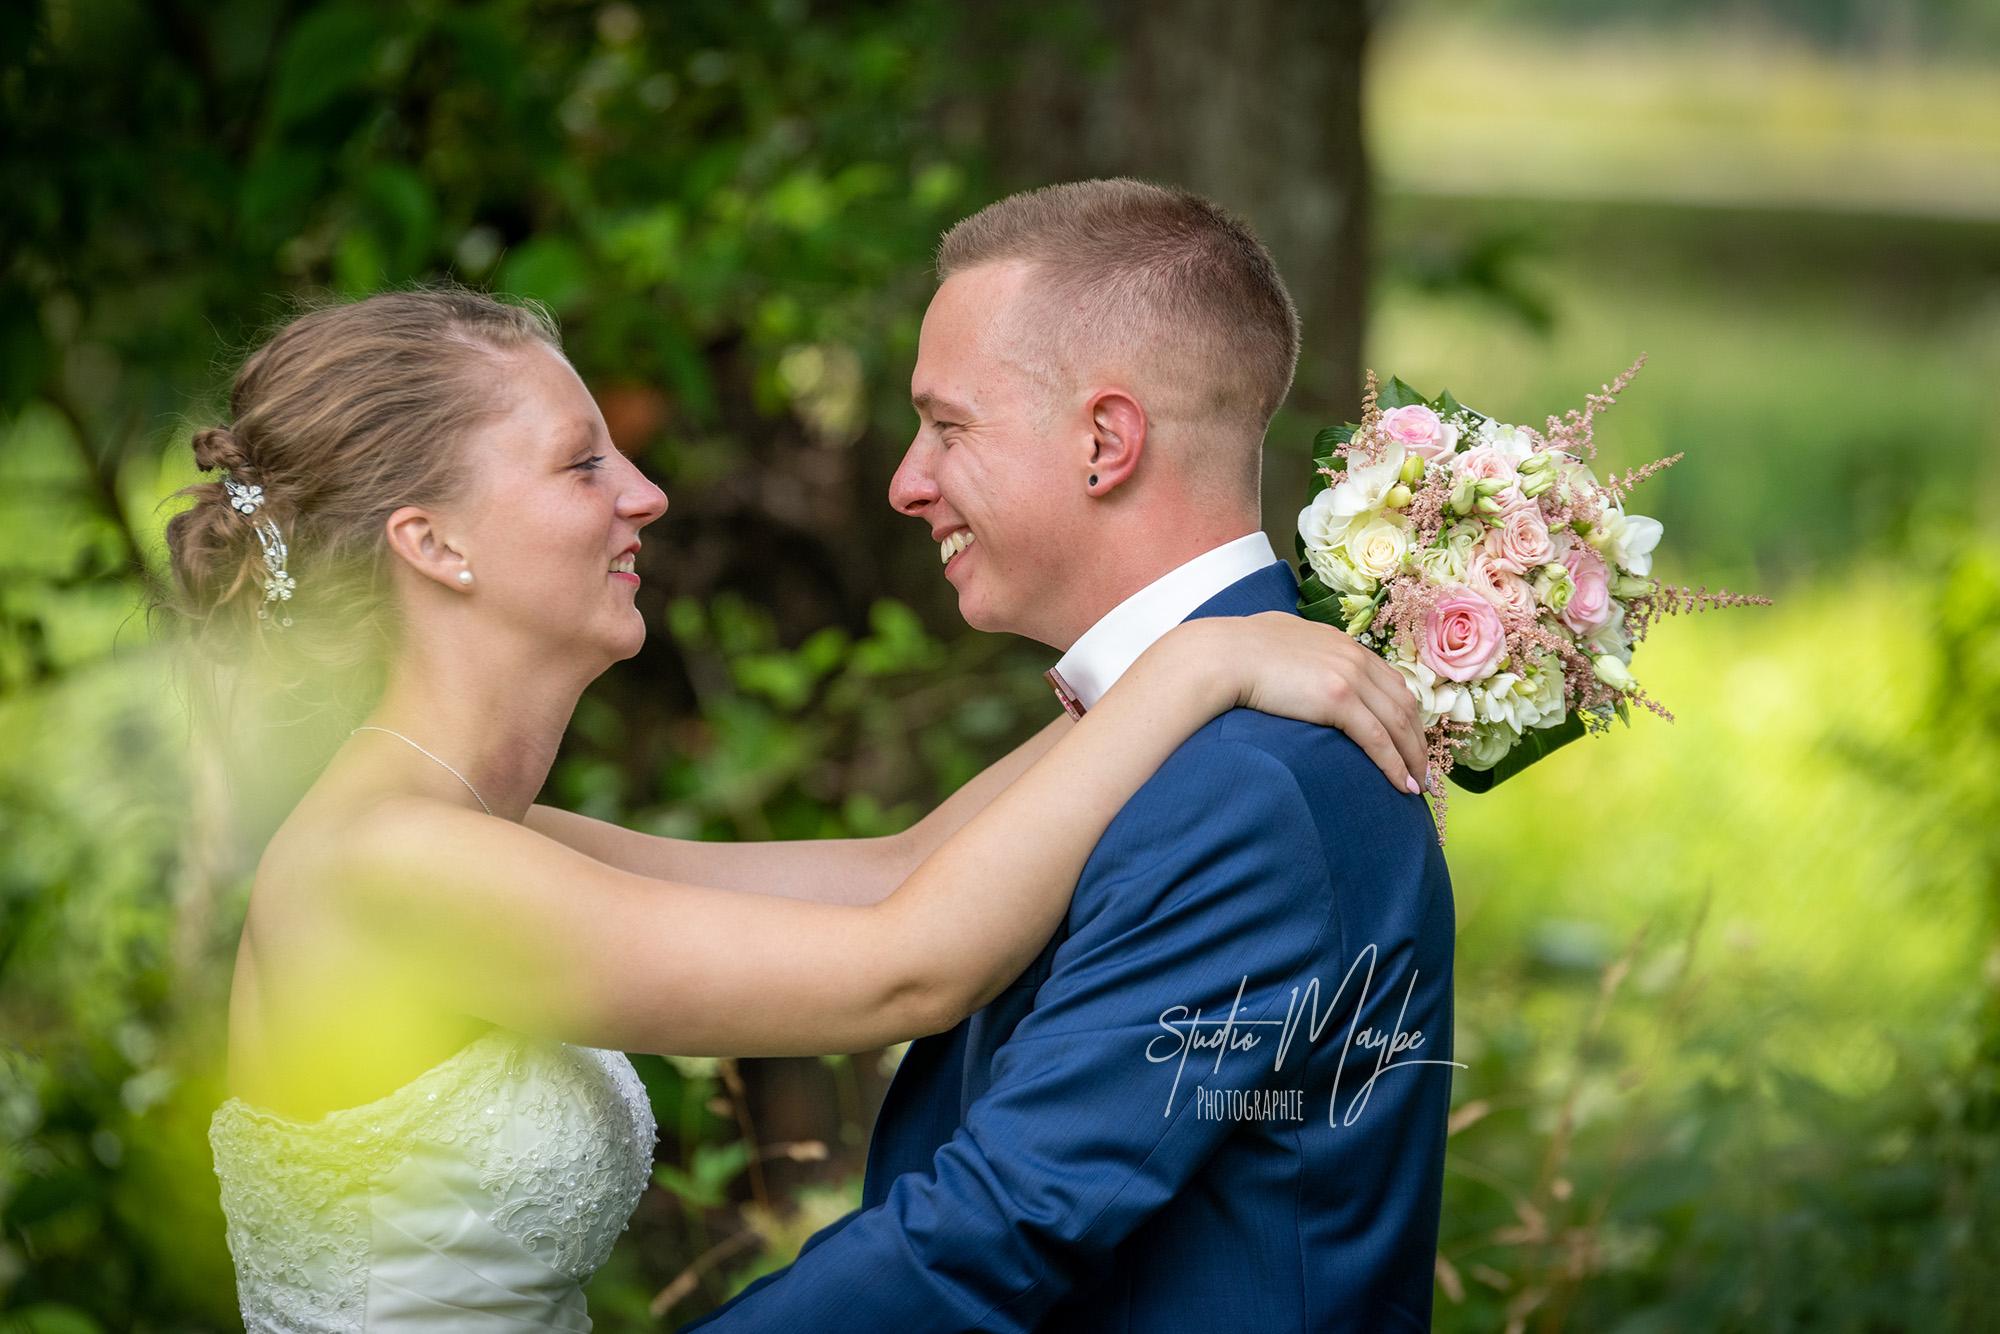 Photographe reportage de mariage